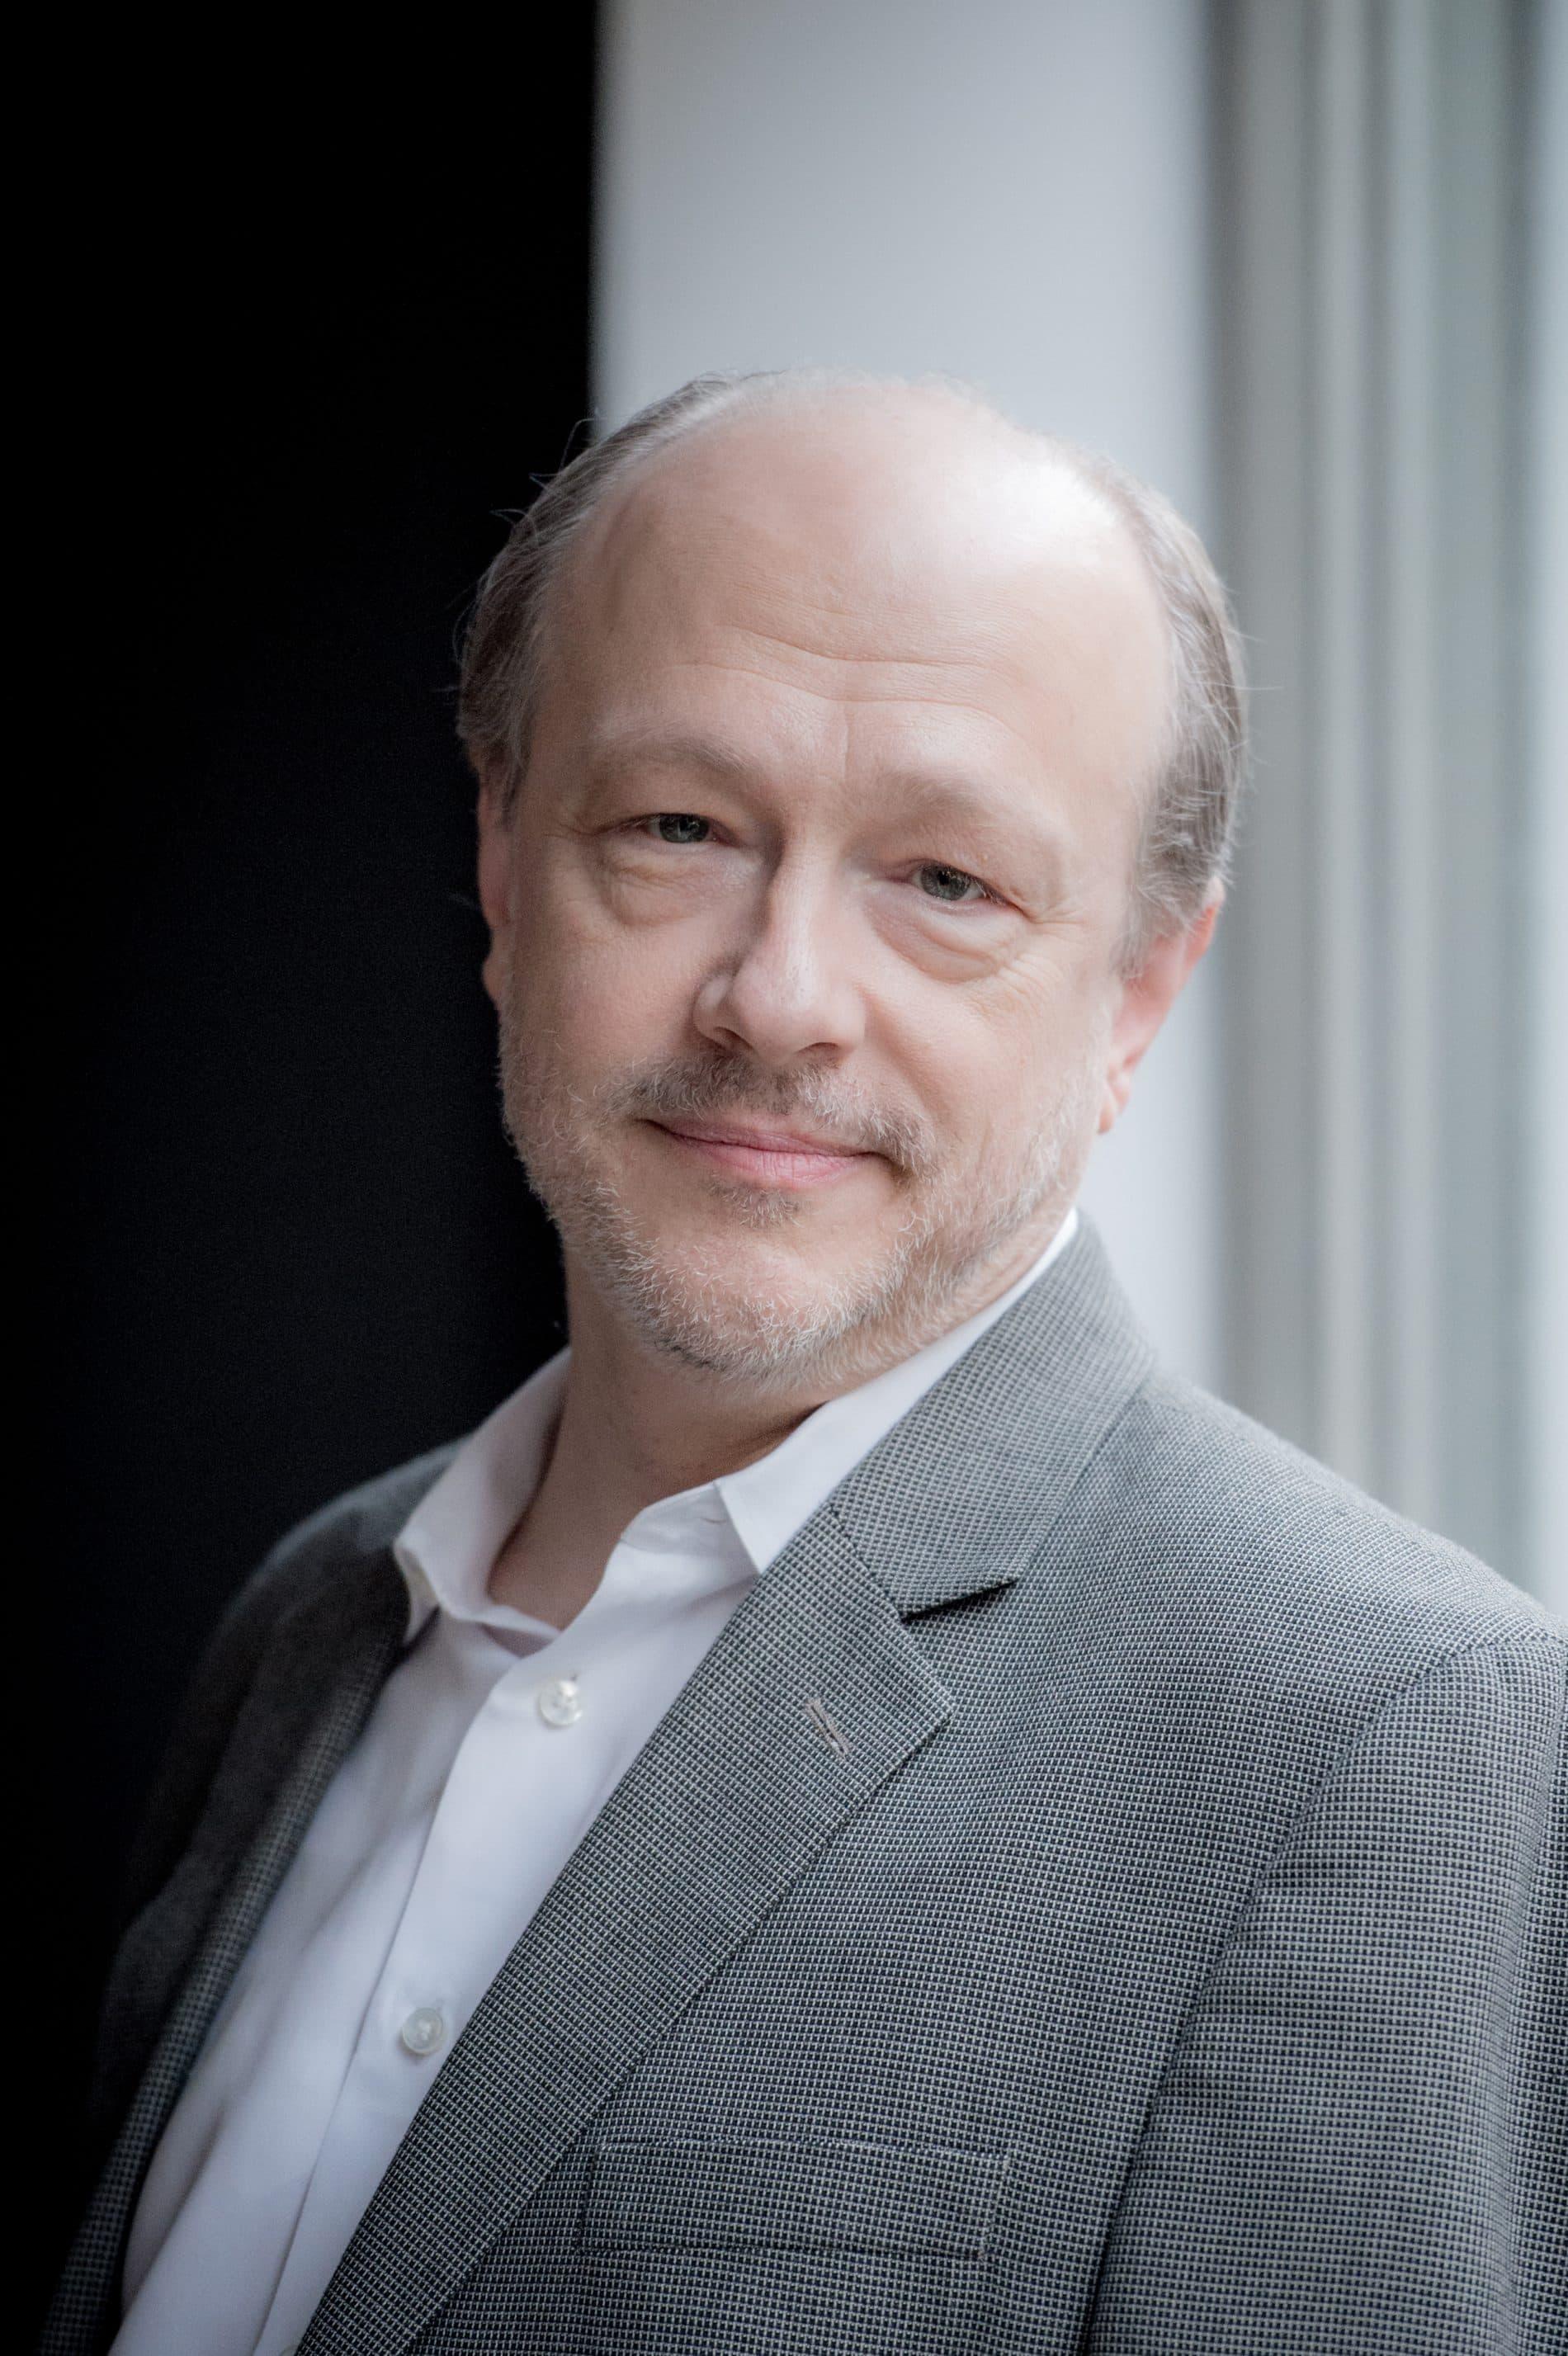 Marc-André Hamelin — Colbert Artists Management